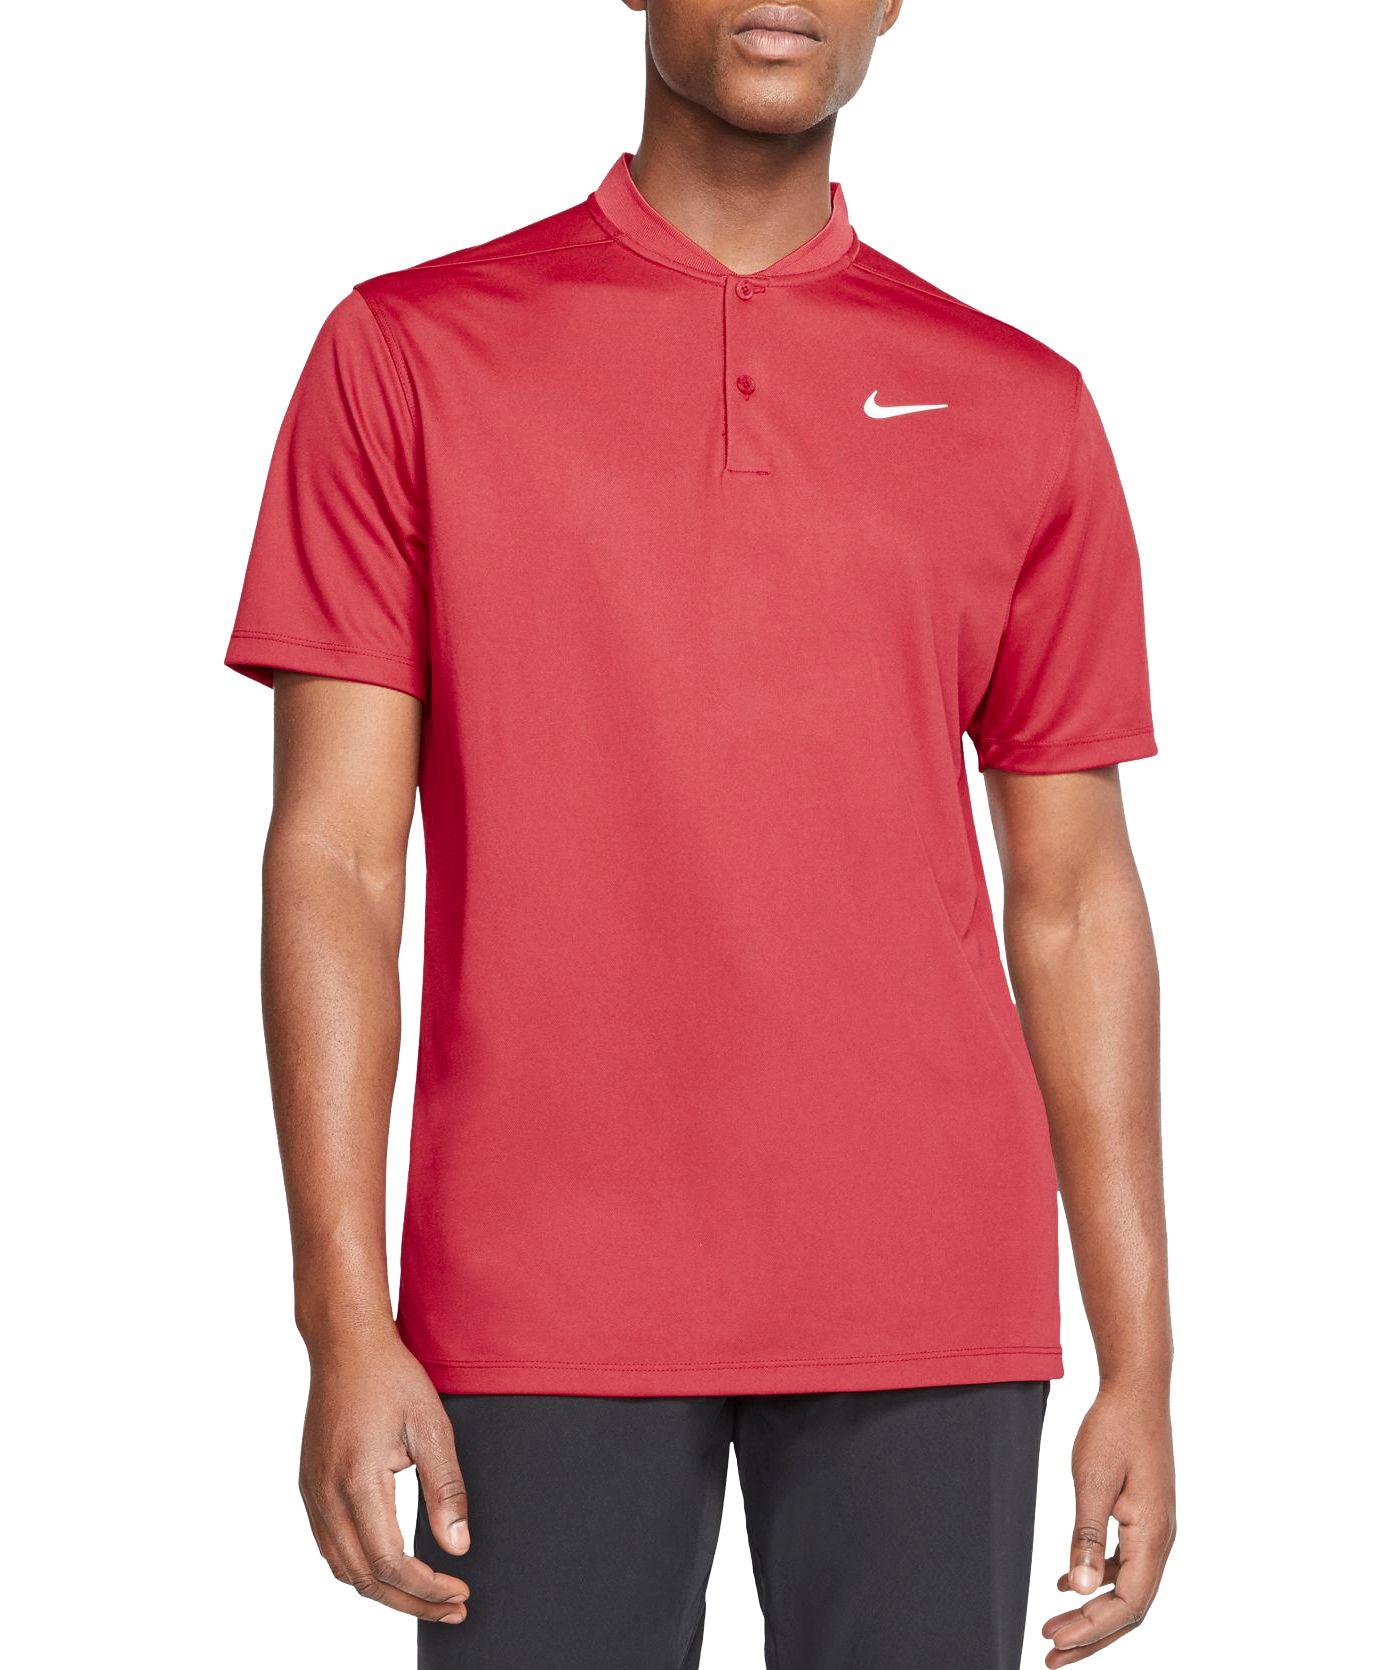 Nike Men's Dri-Fit Victory Blade Golf Polo